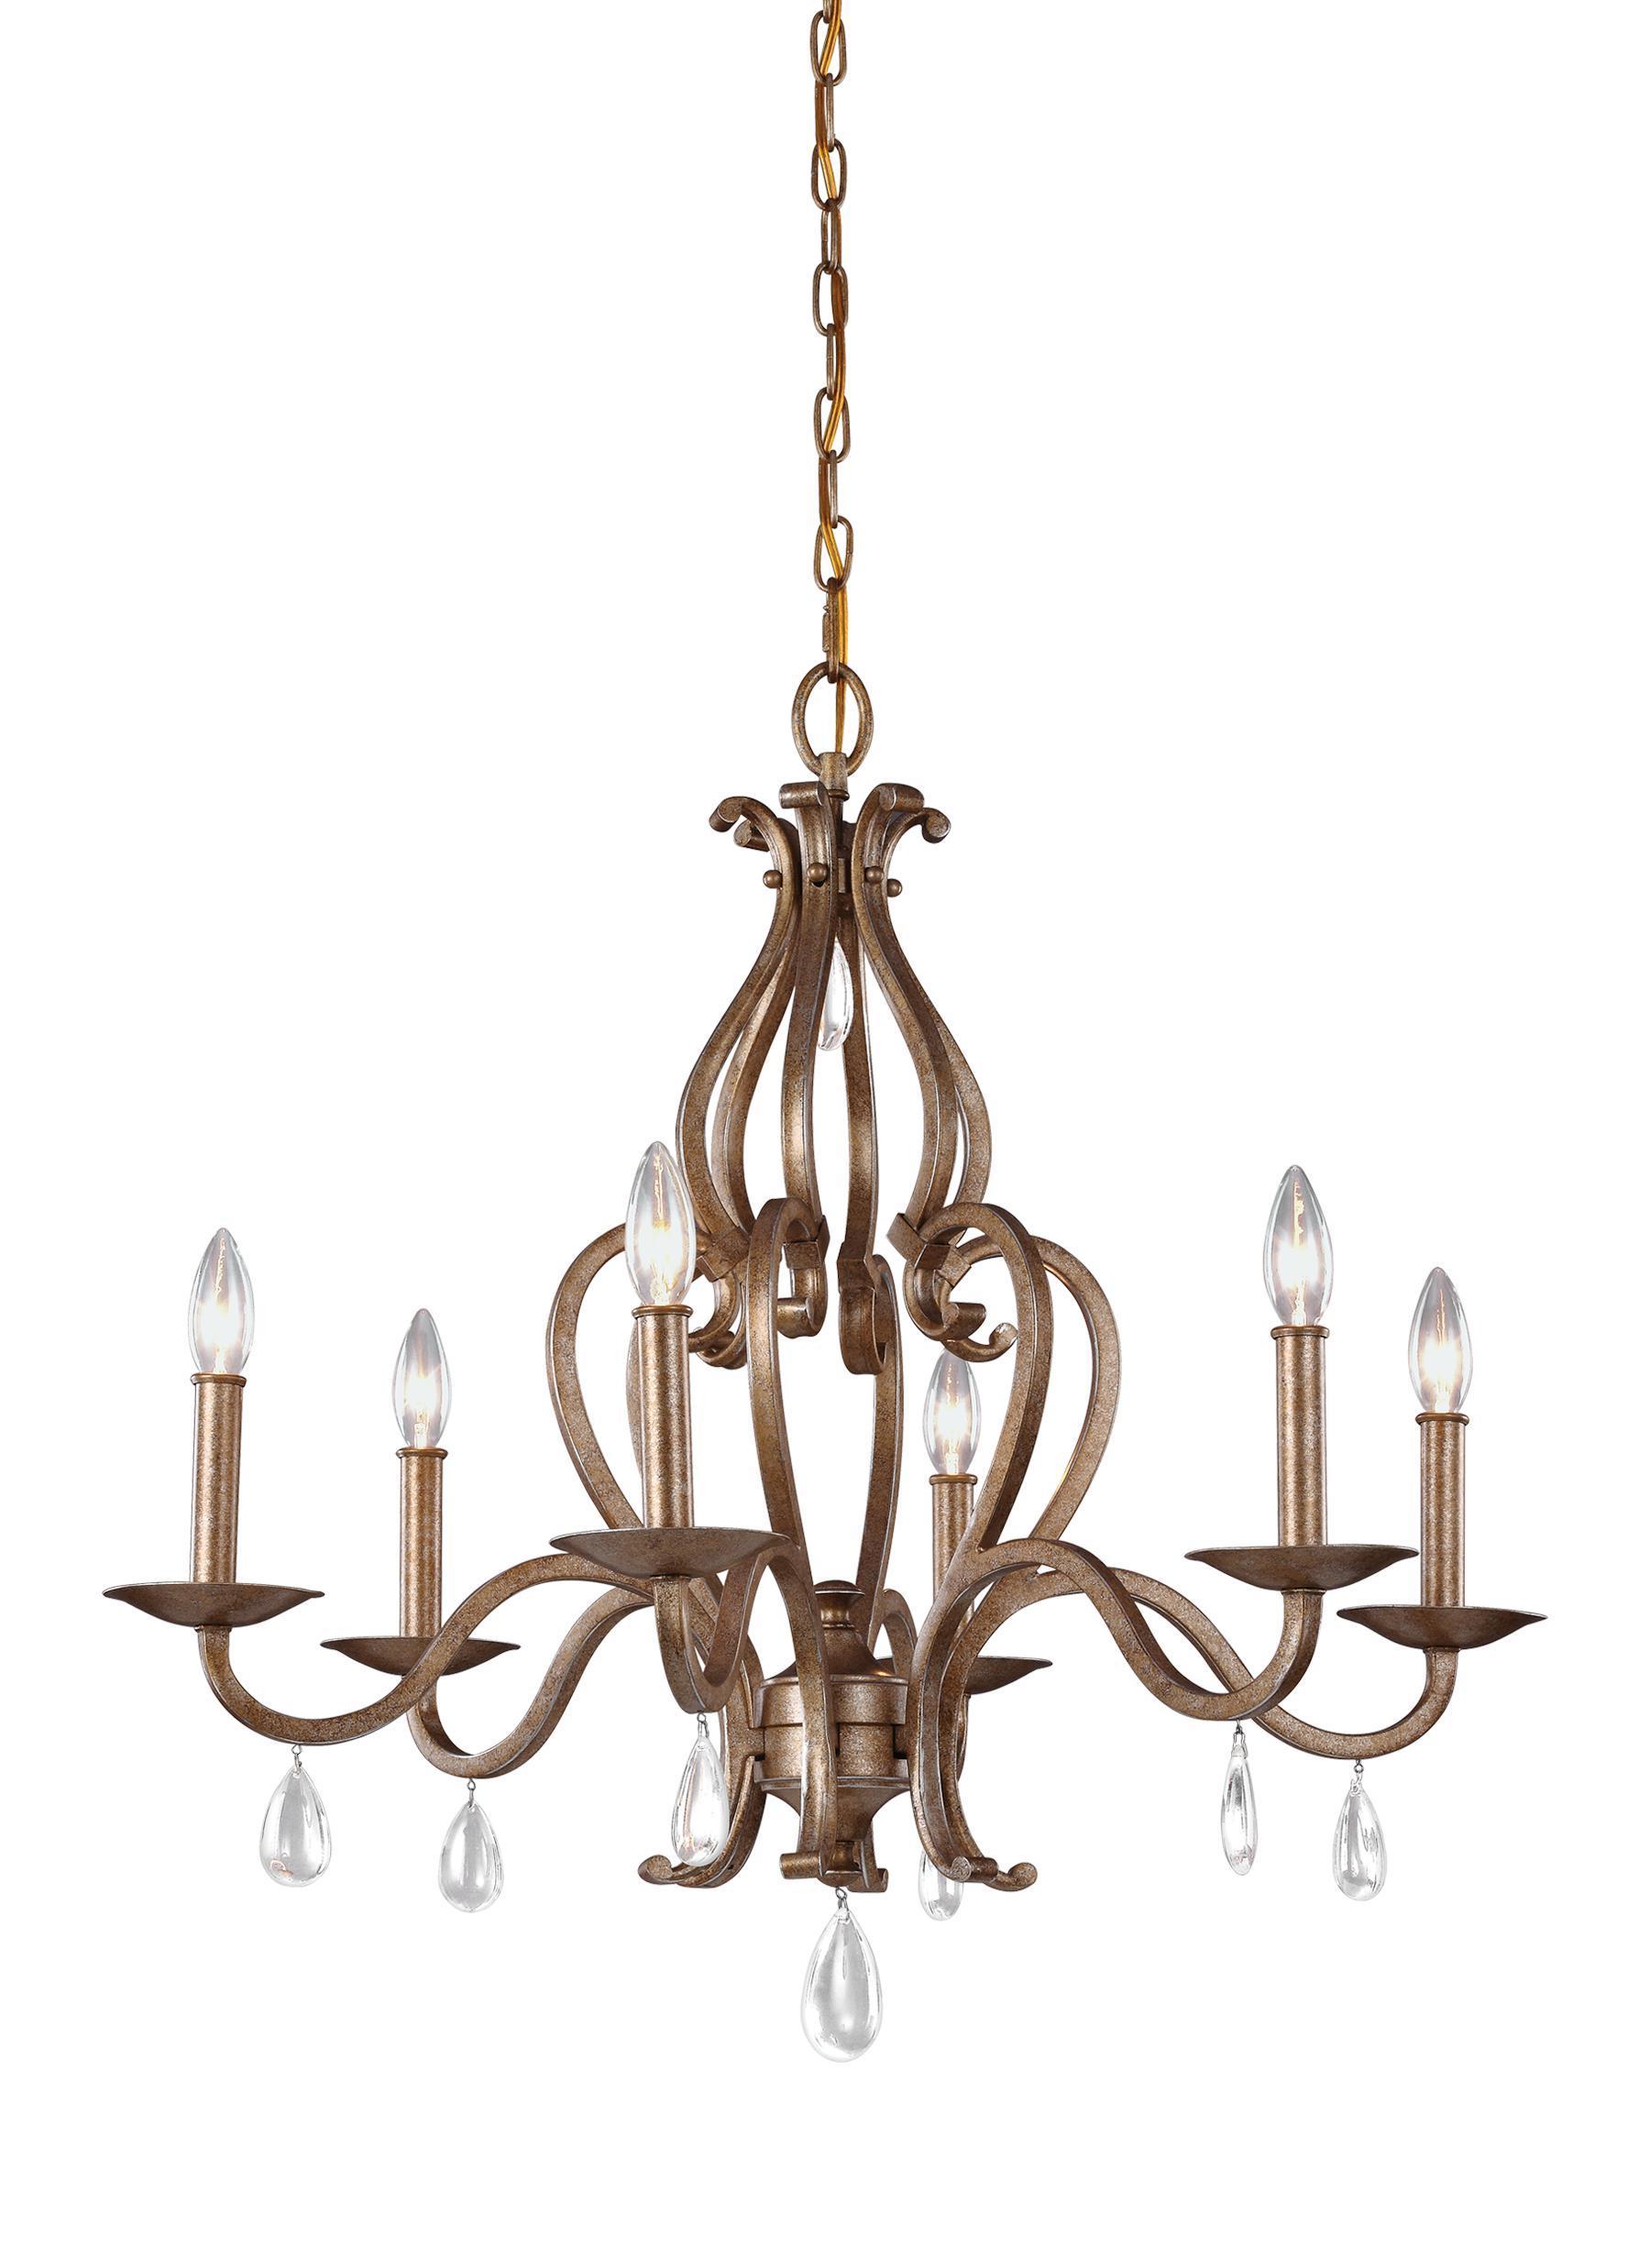 Lamp chandelier wonderful murray feiss lighting for home lighting girly light fixtures murray feiss murray feiss mirrors arubaitofo Gallery